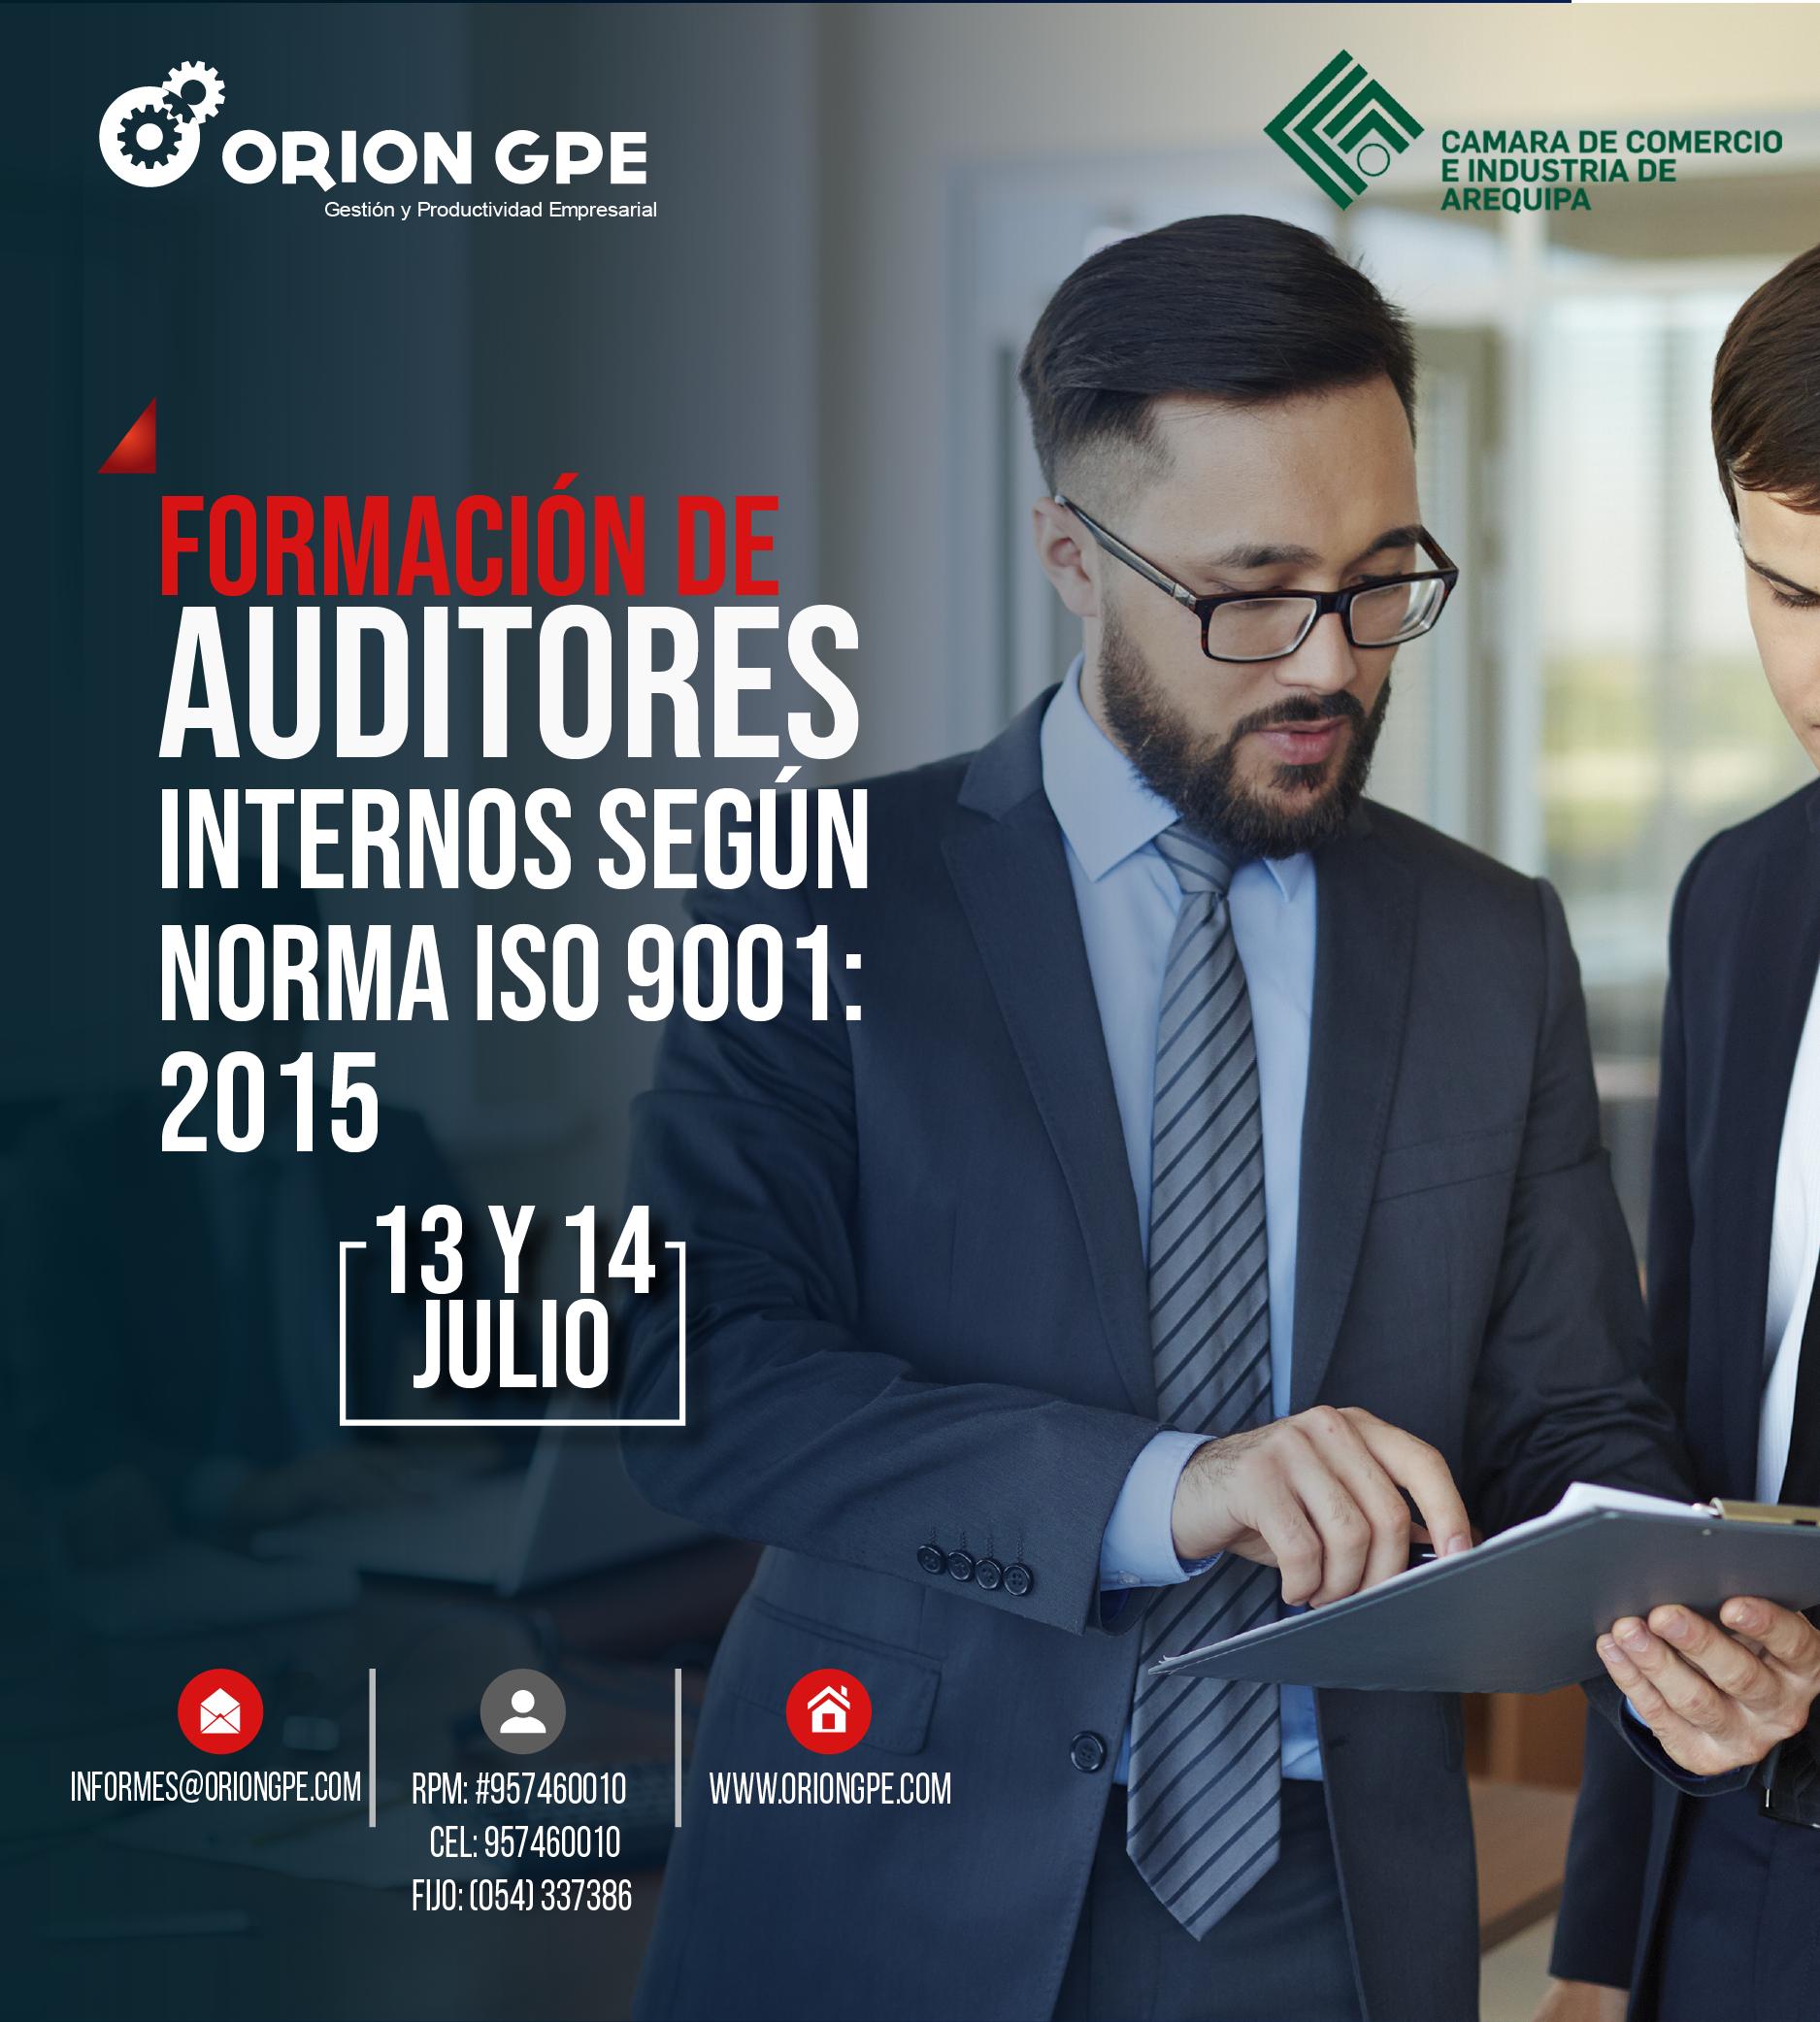 En este momento estás viendo FORMACIÓN DE AUDITORES INTERNOS SEGÚN NORMA ISO 9001